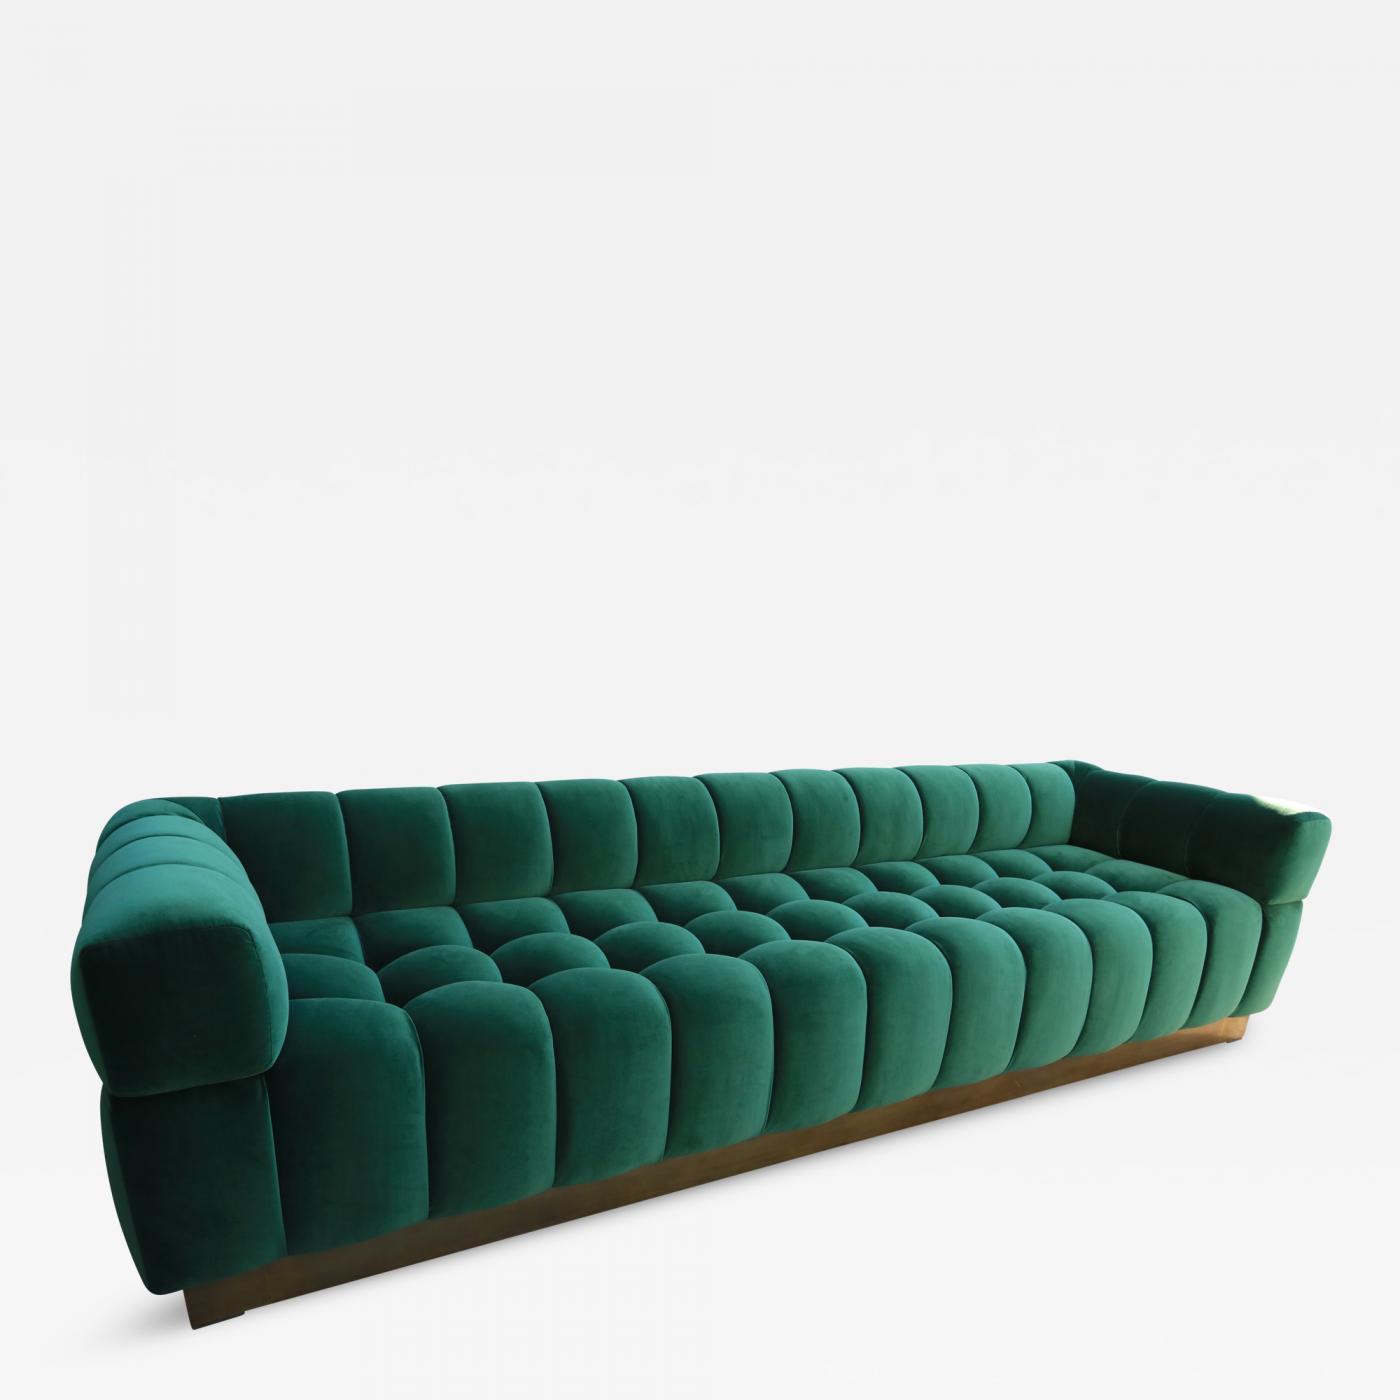 custom sofa los angeles ca rattan corner with storage box adesso studio - tufted green velvet brass ...